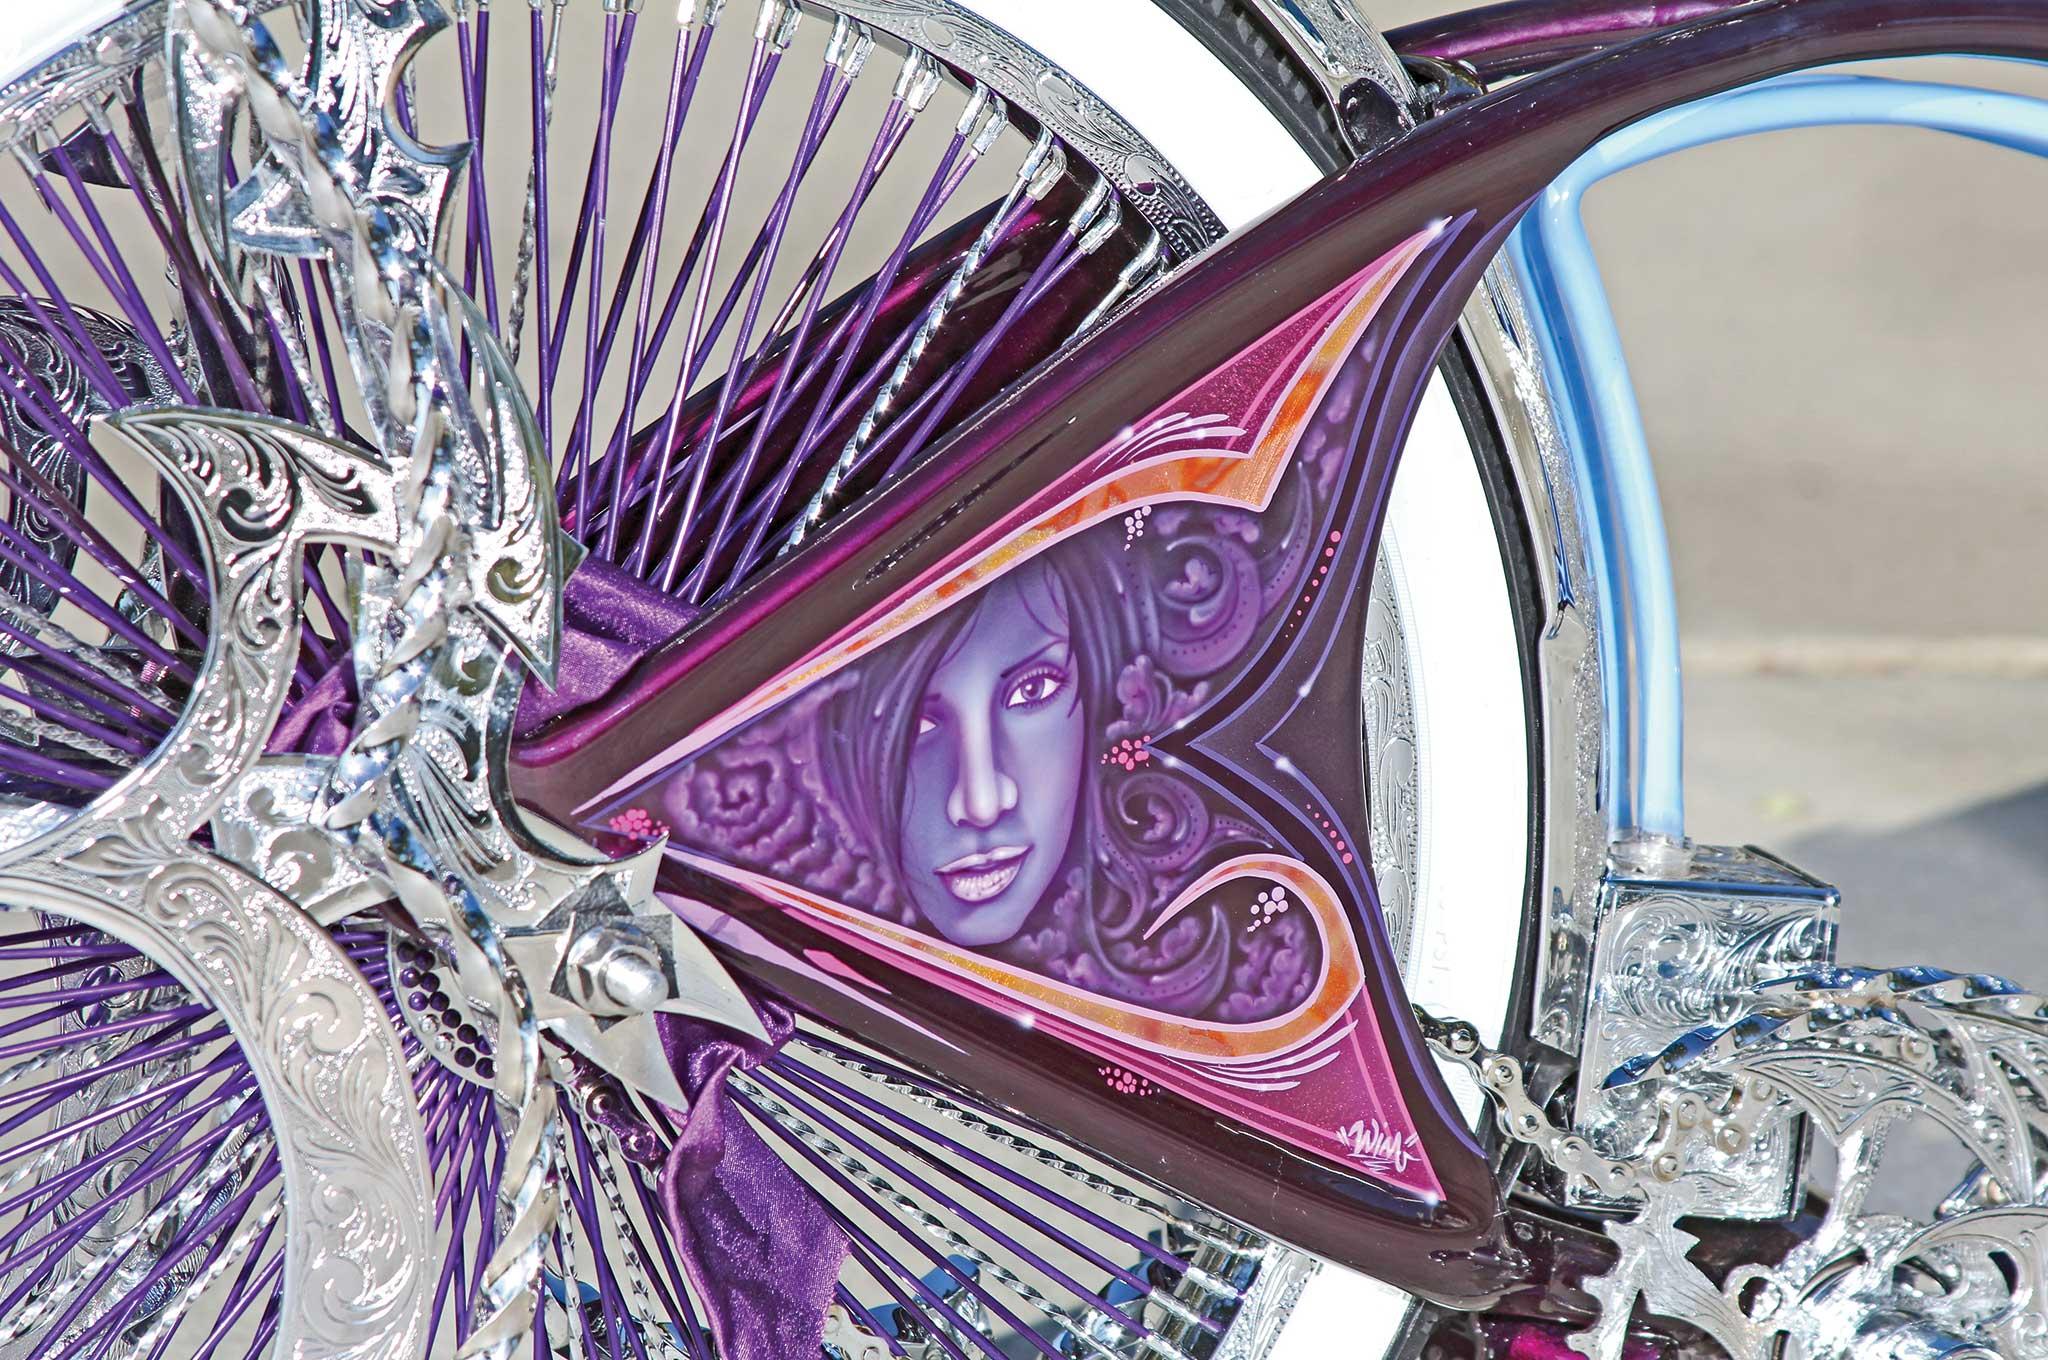 002 1967 schwinn bicycle airbrushed mural